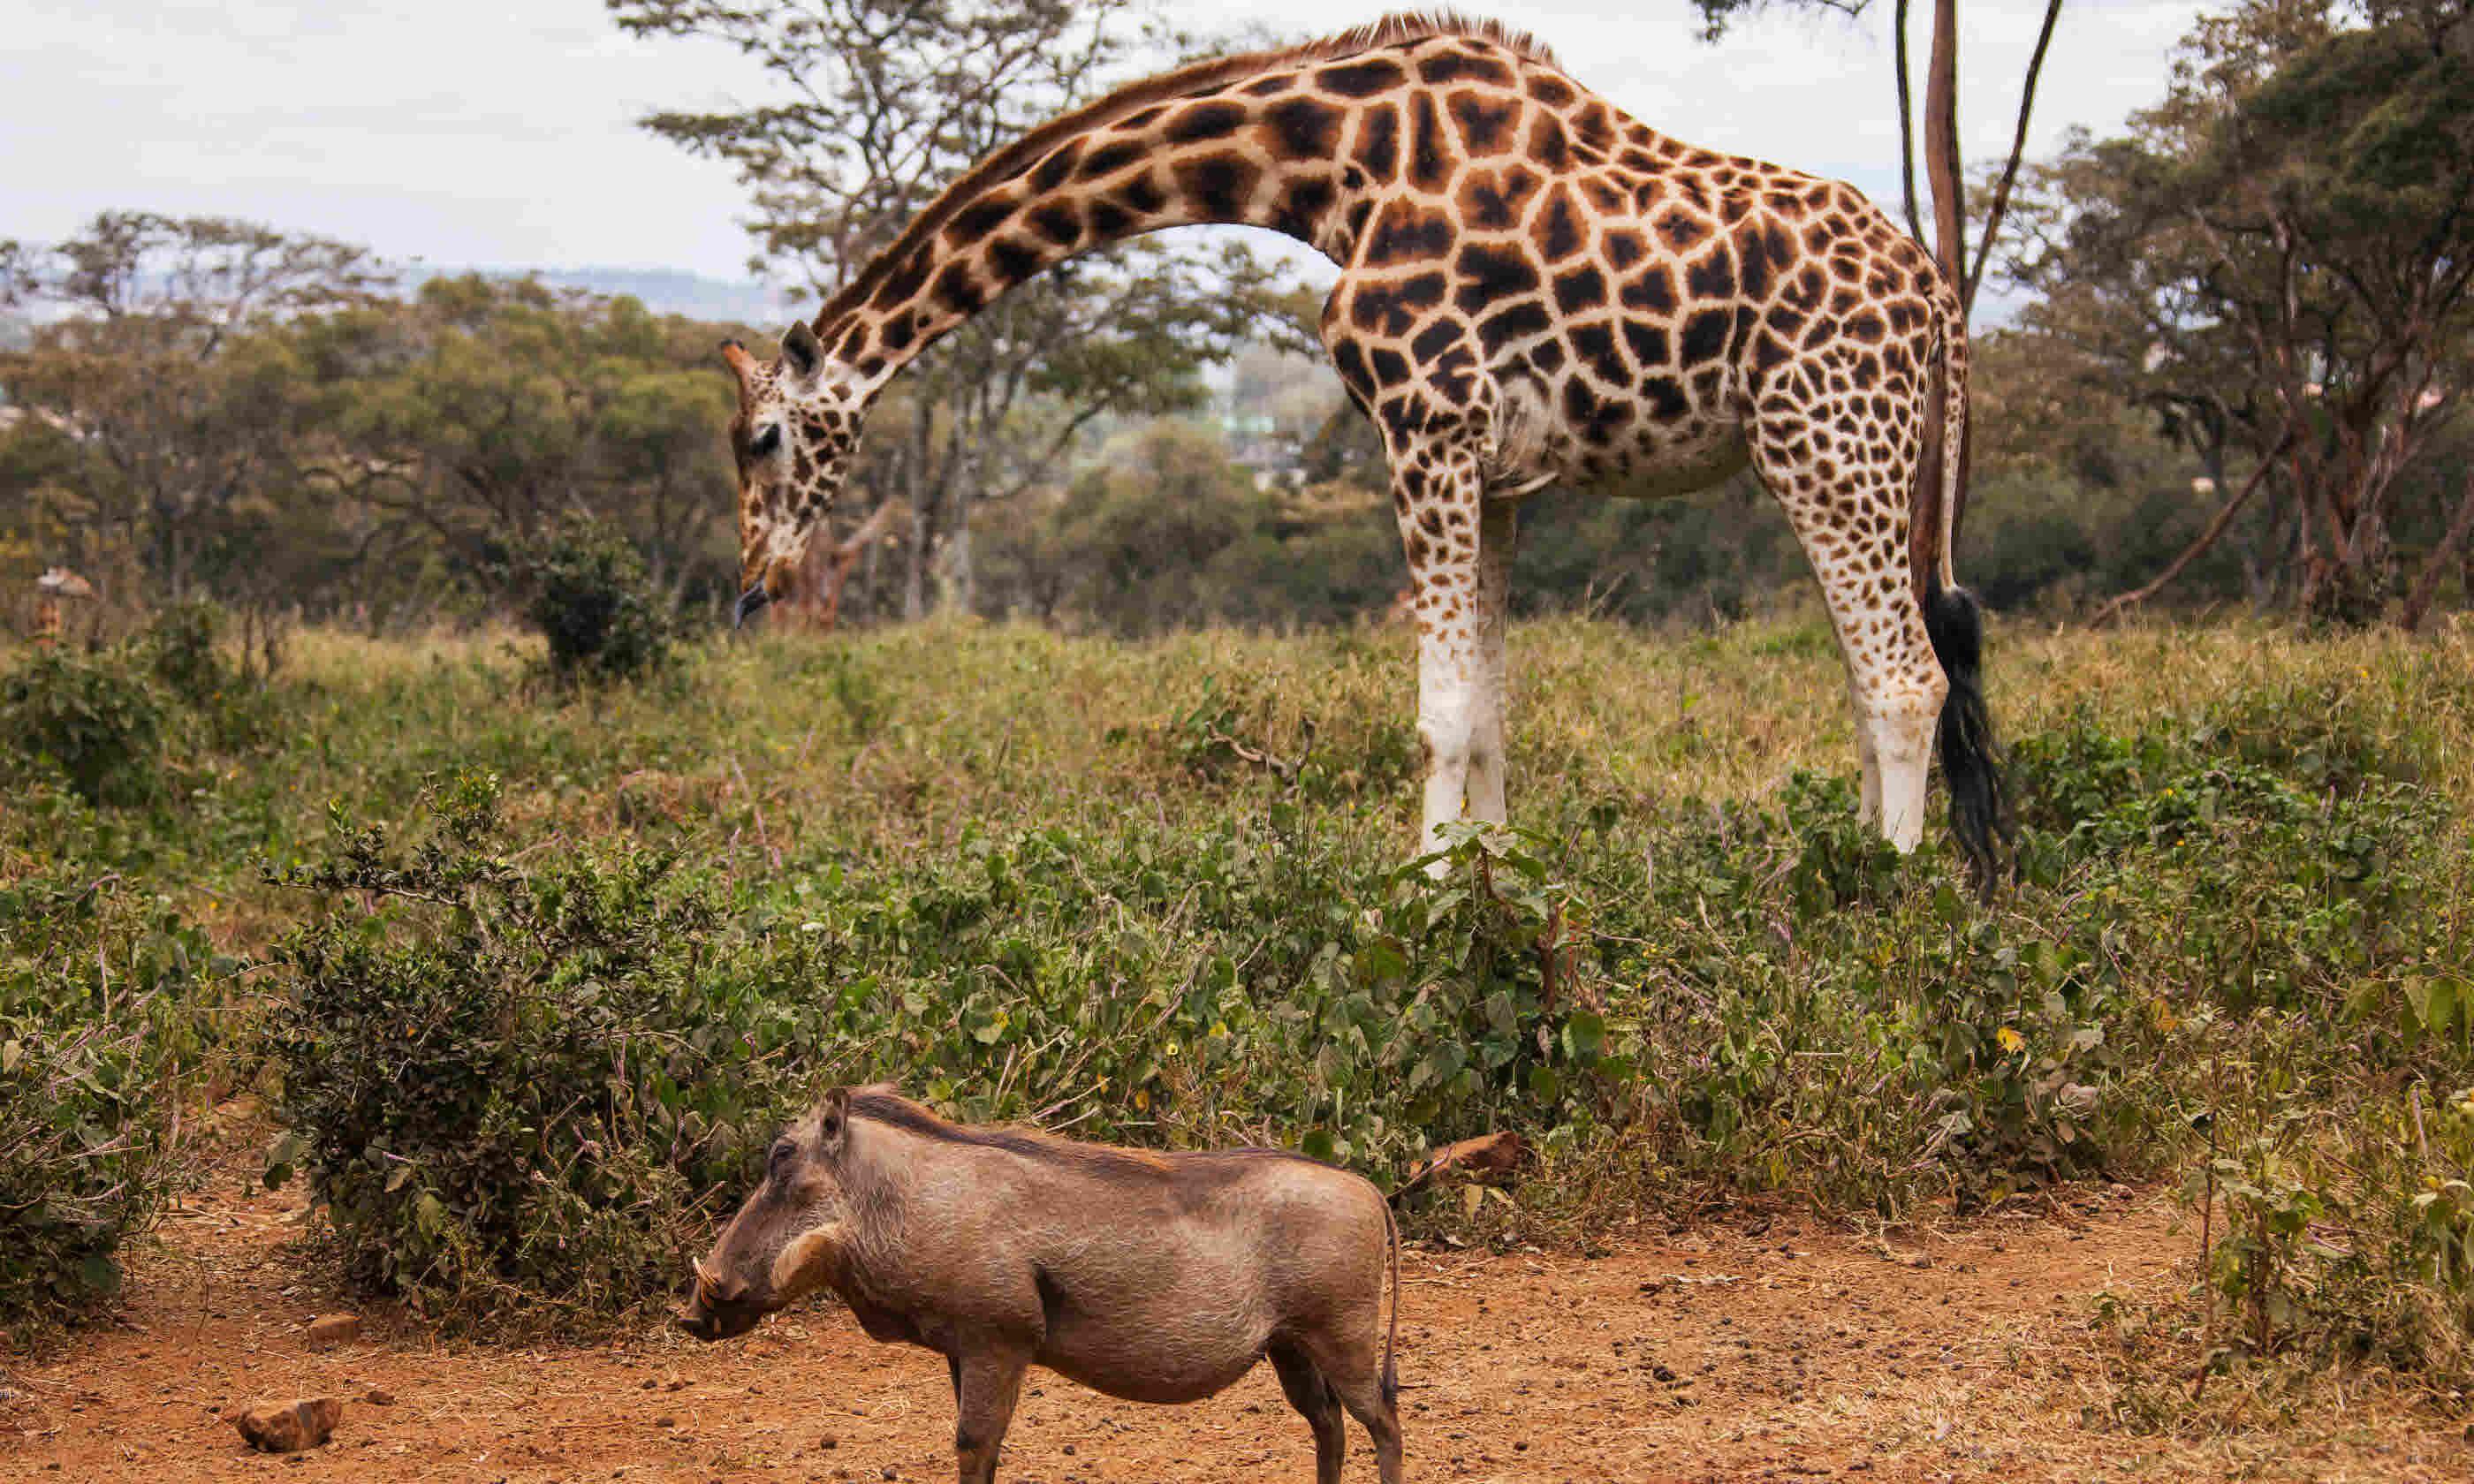 Giraffe Centre, Nairobi, Kenya (Shutterstock)